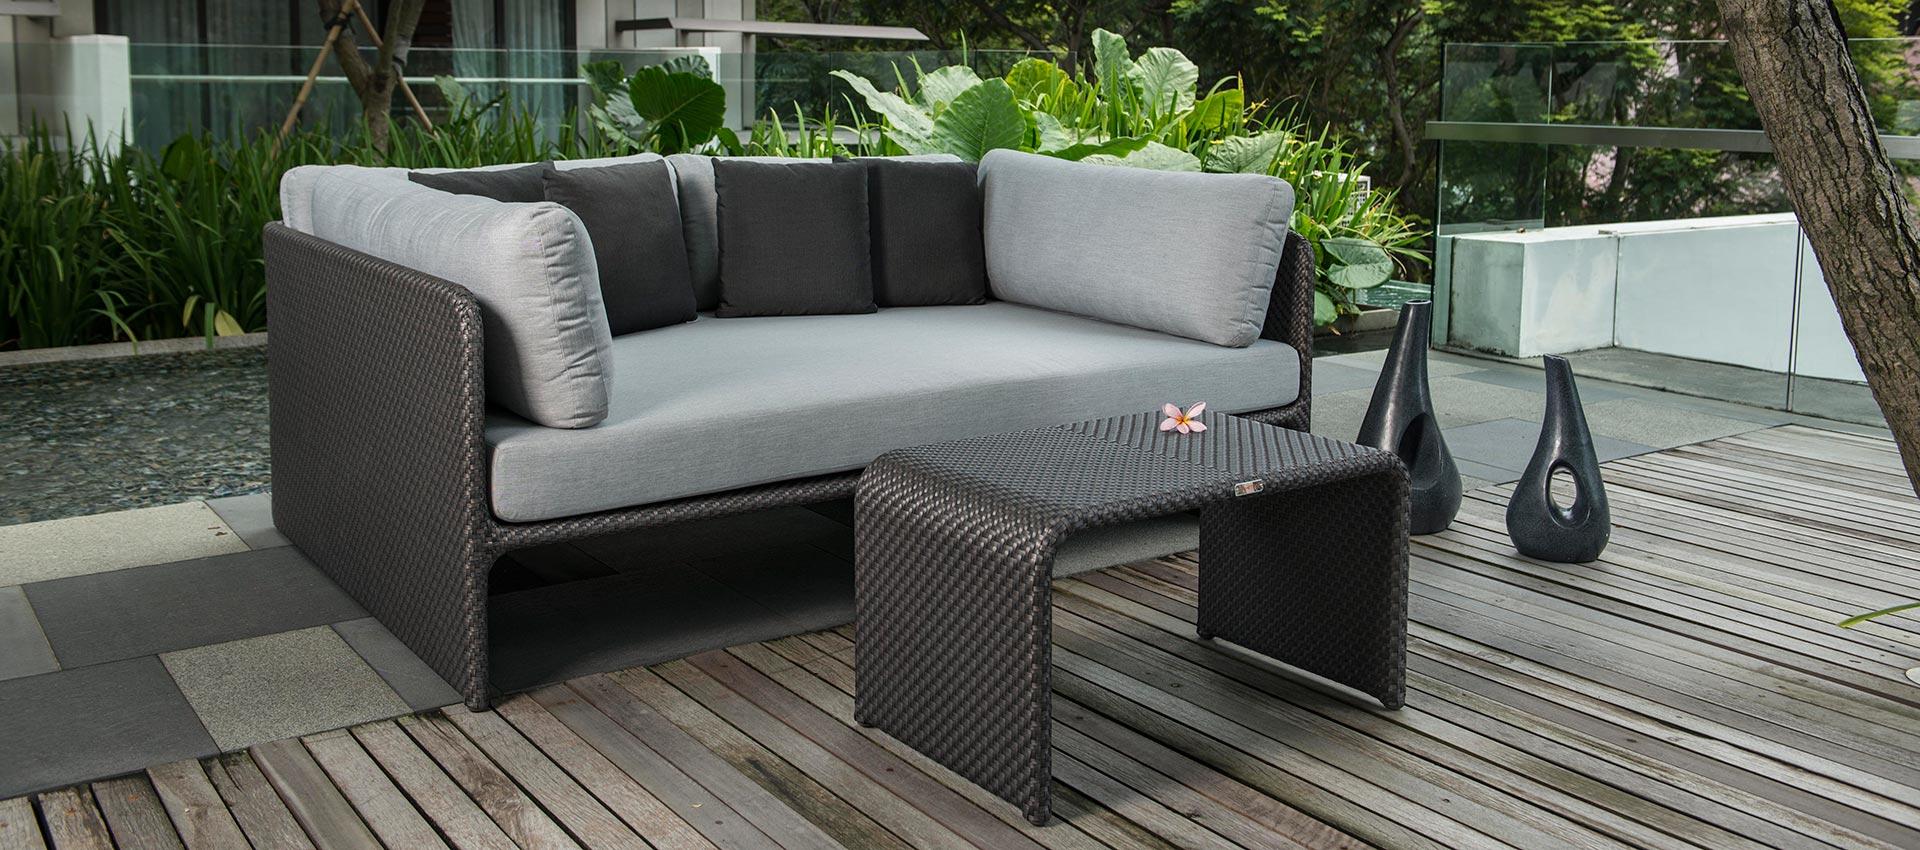 Top Tips To Help You Choose Garden Furniture Easily Ask